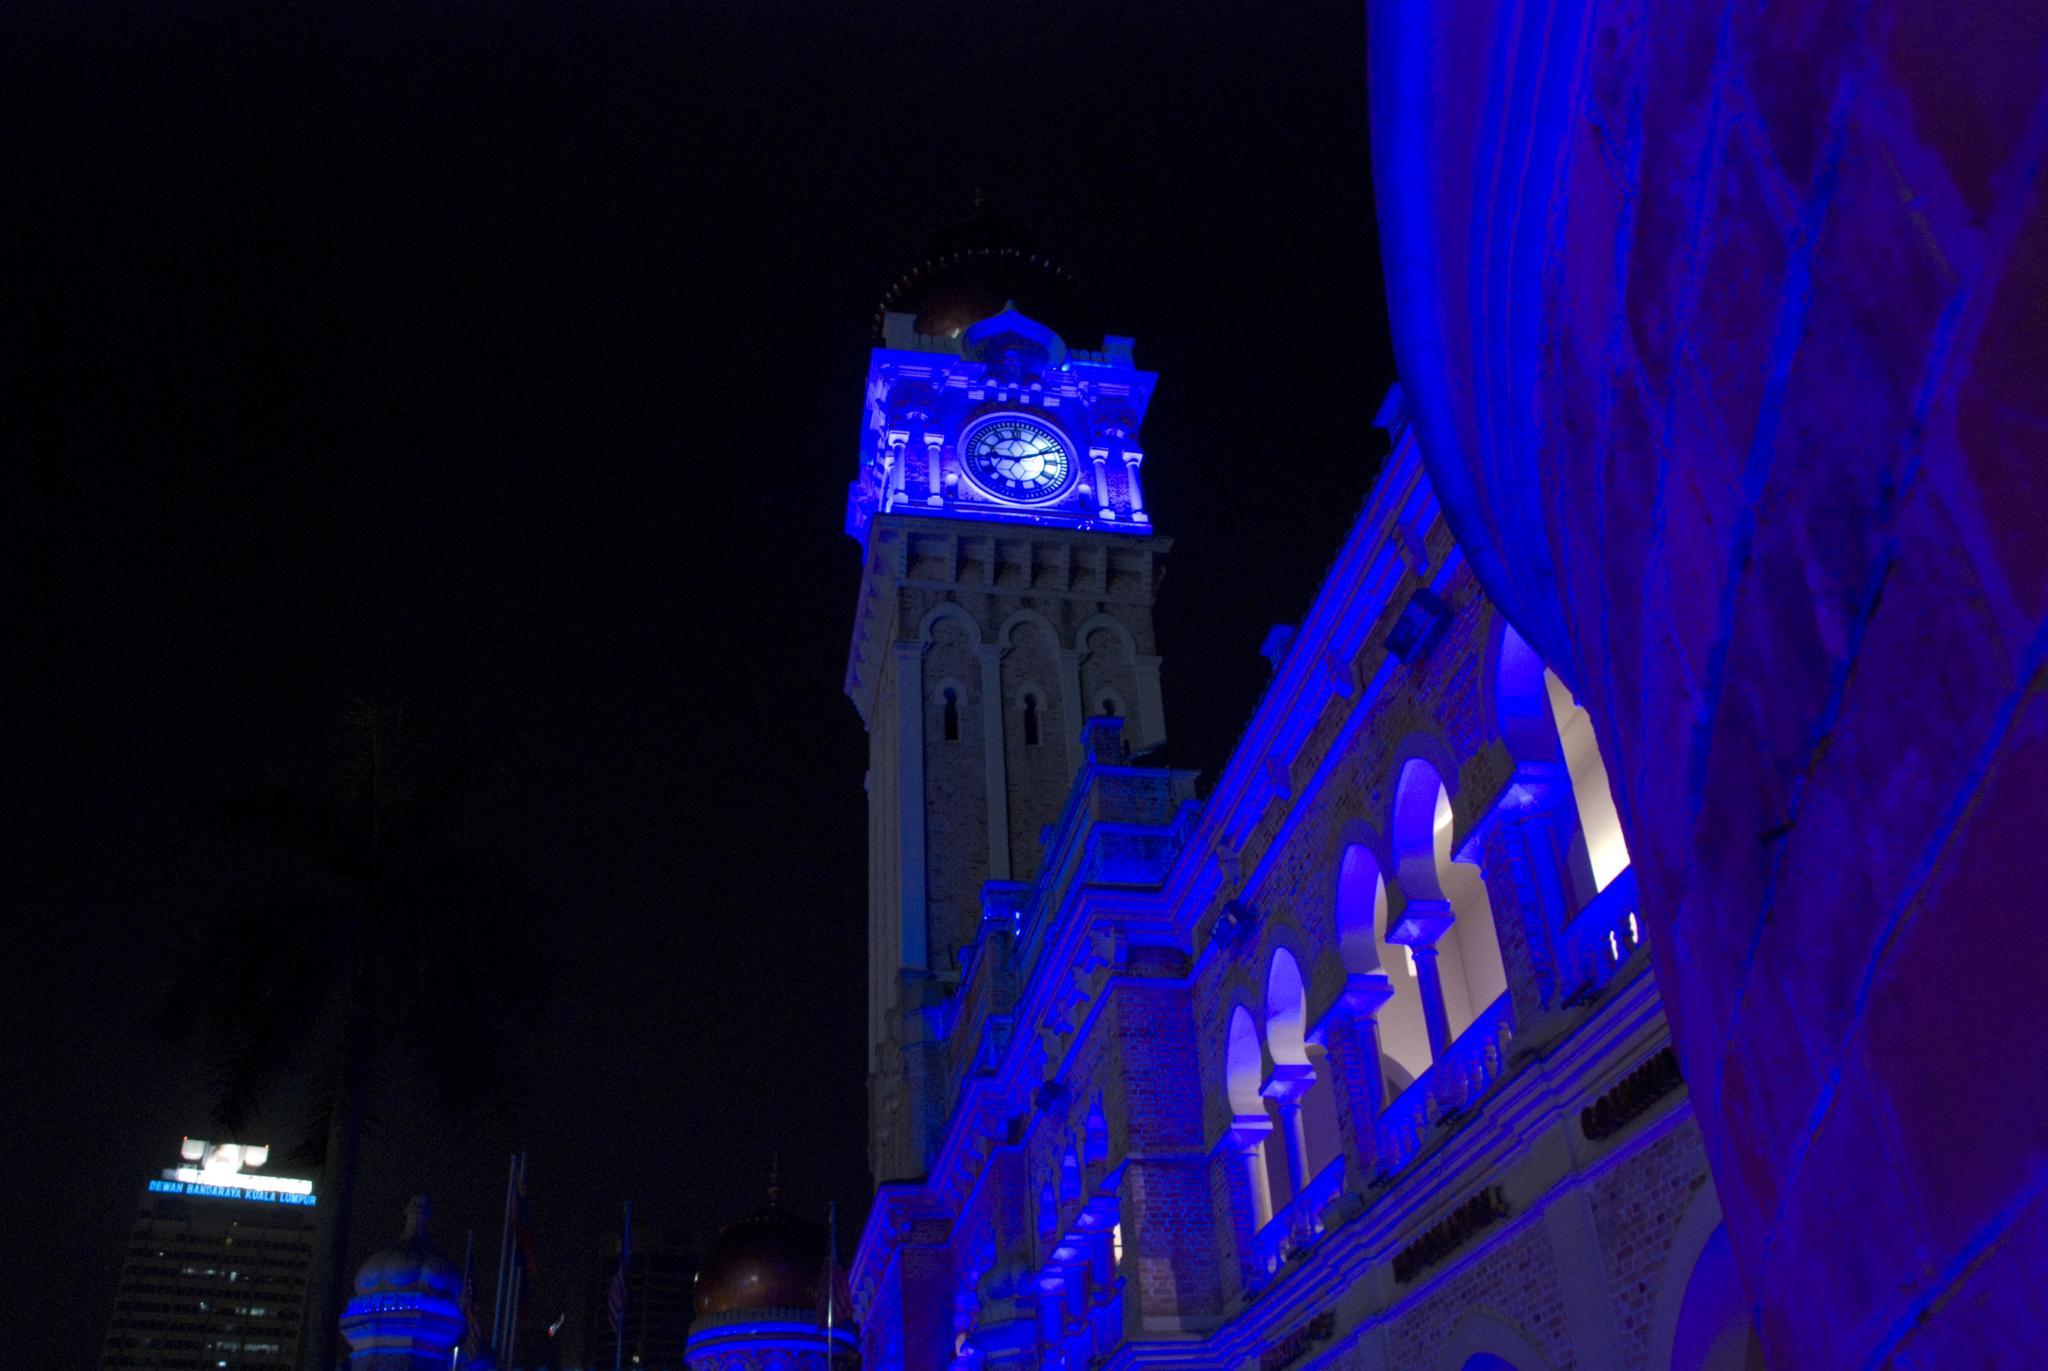 Beautiful lighting of buildings in Kuala Lumpur.